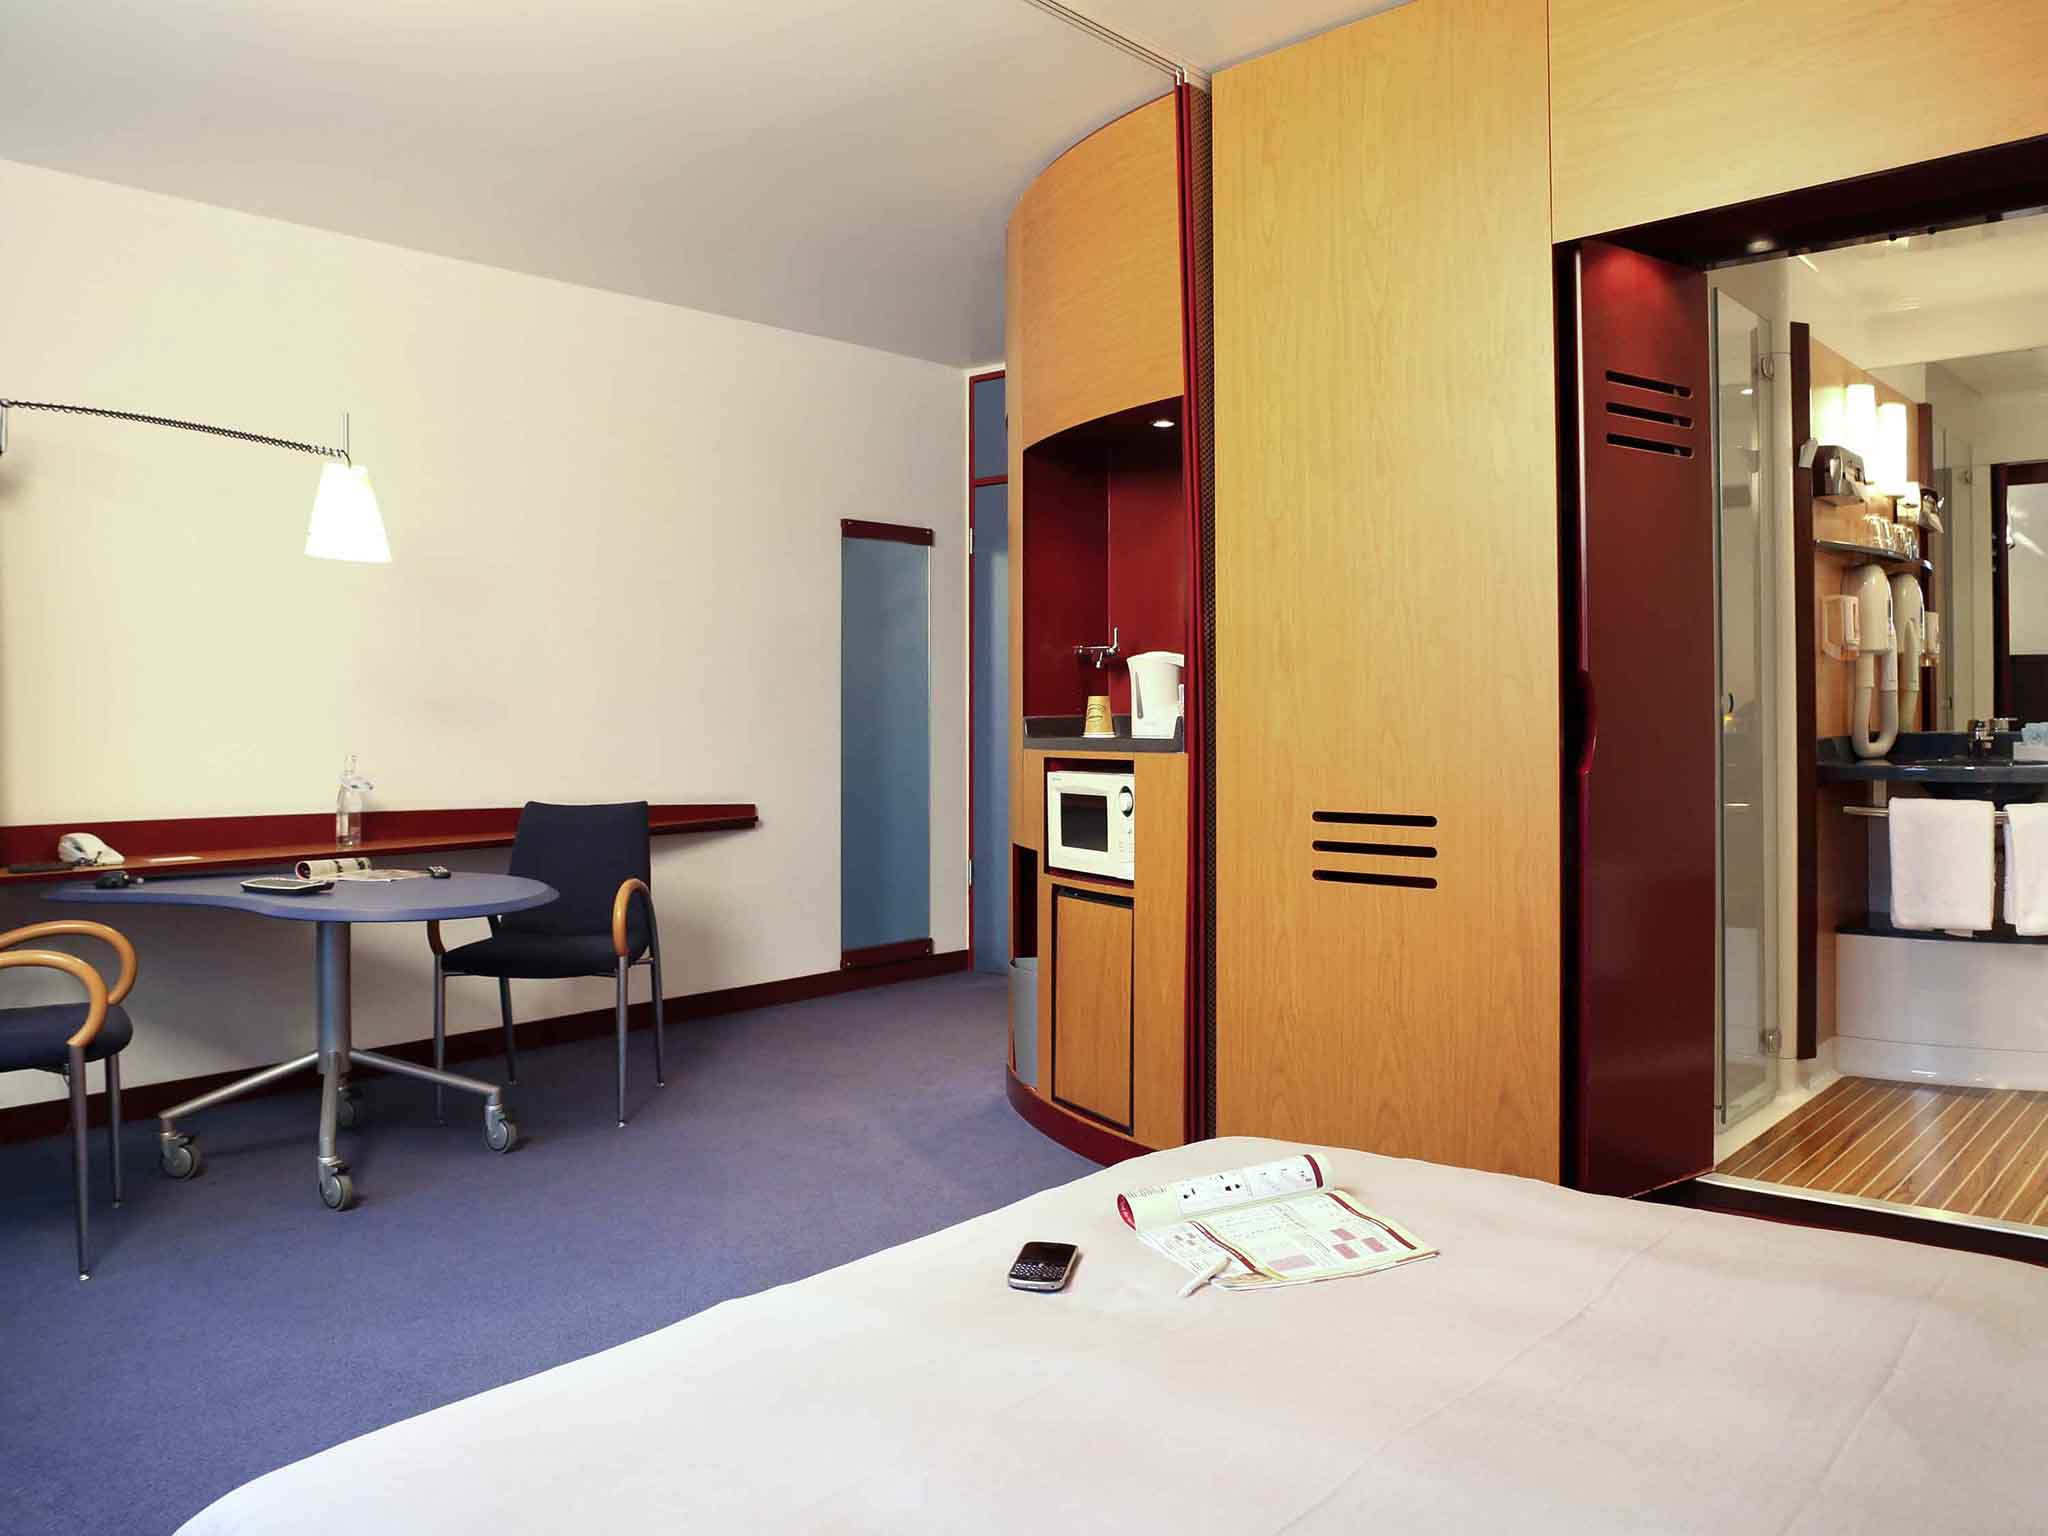 Hotel Novotel Suites Hamburg City. Book now! Free Massages